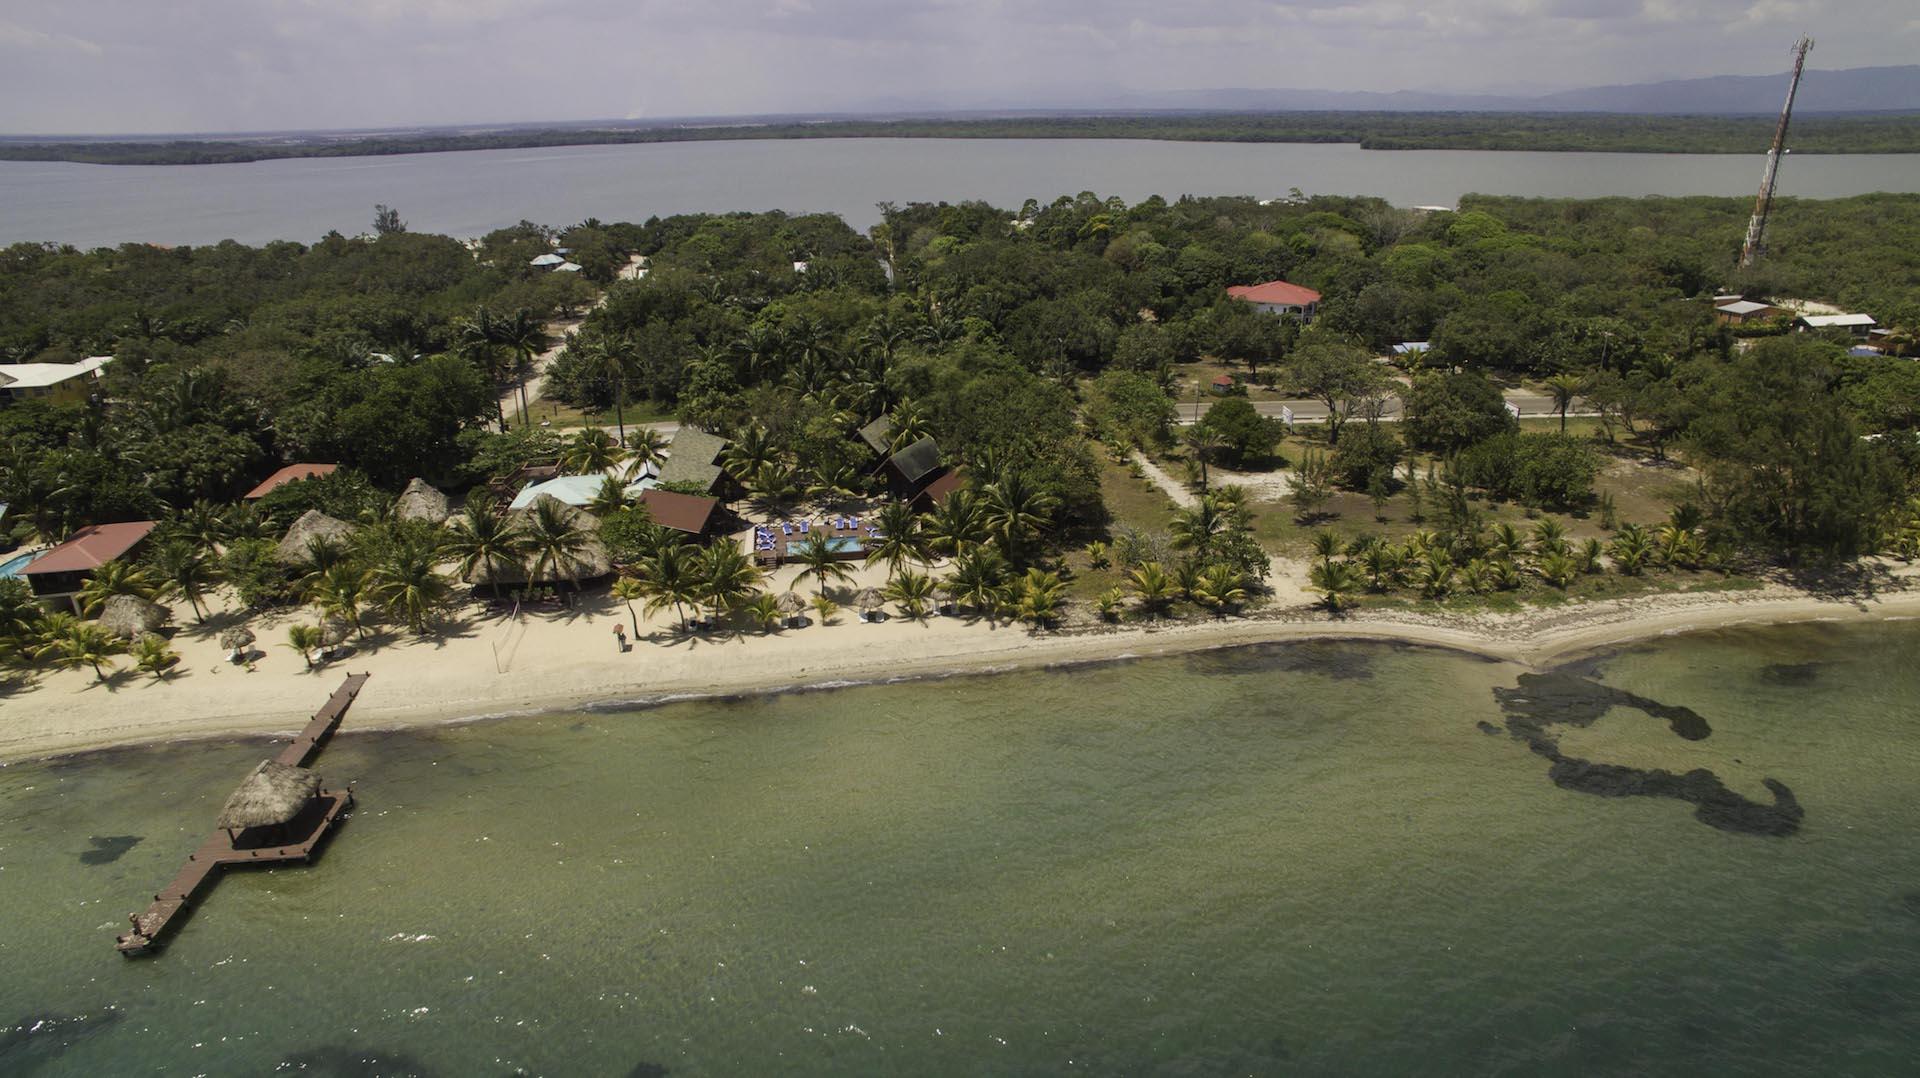 Belize Beachfront Resort with Beach Houses